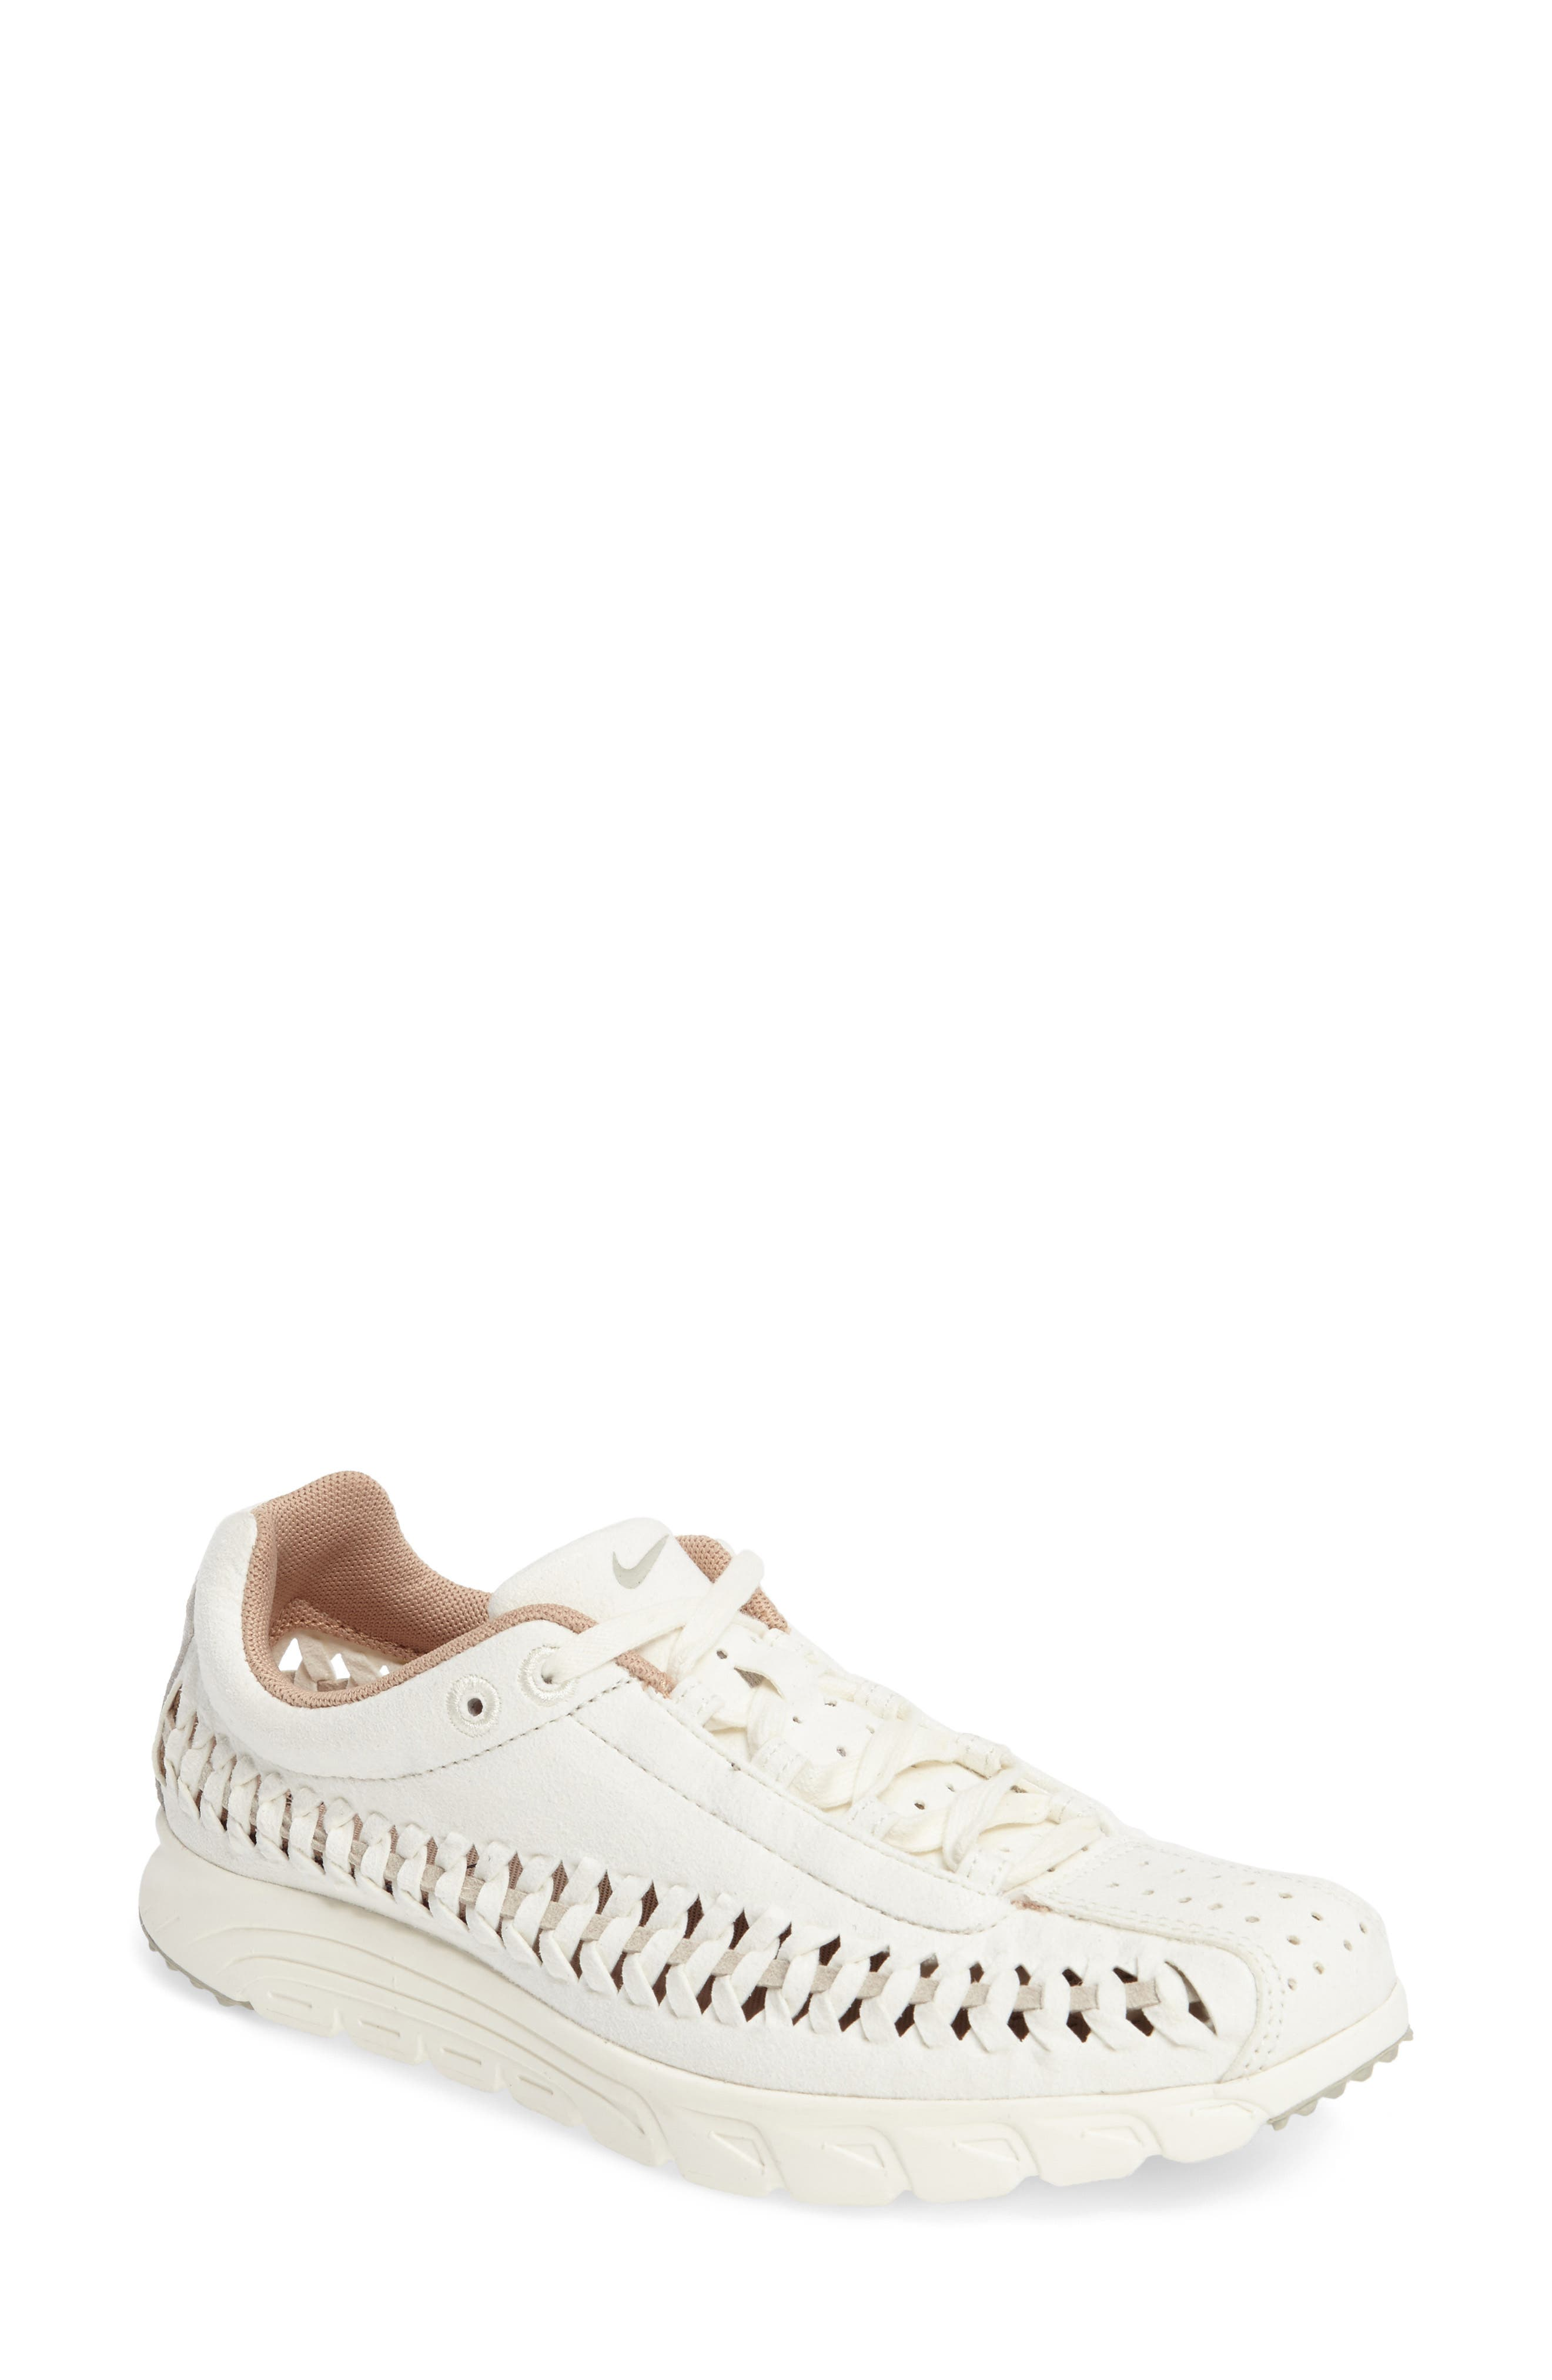 'Mayfly Woven' Sneaker,                         Main,                         color, Sail/ Pale Grey/ Elm/ Sail